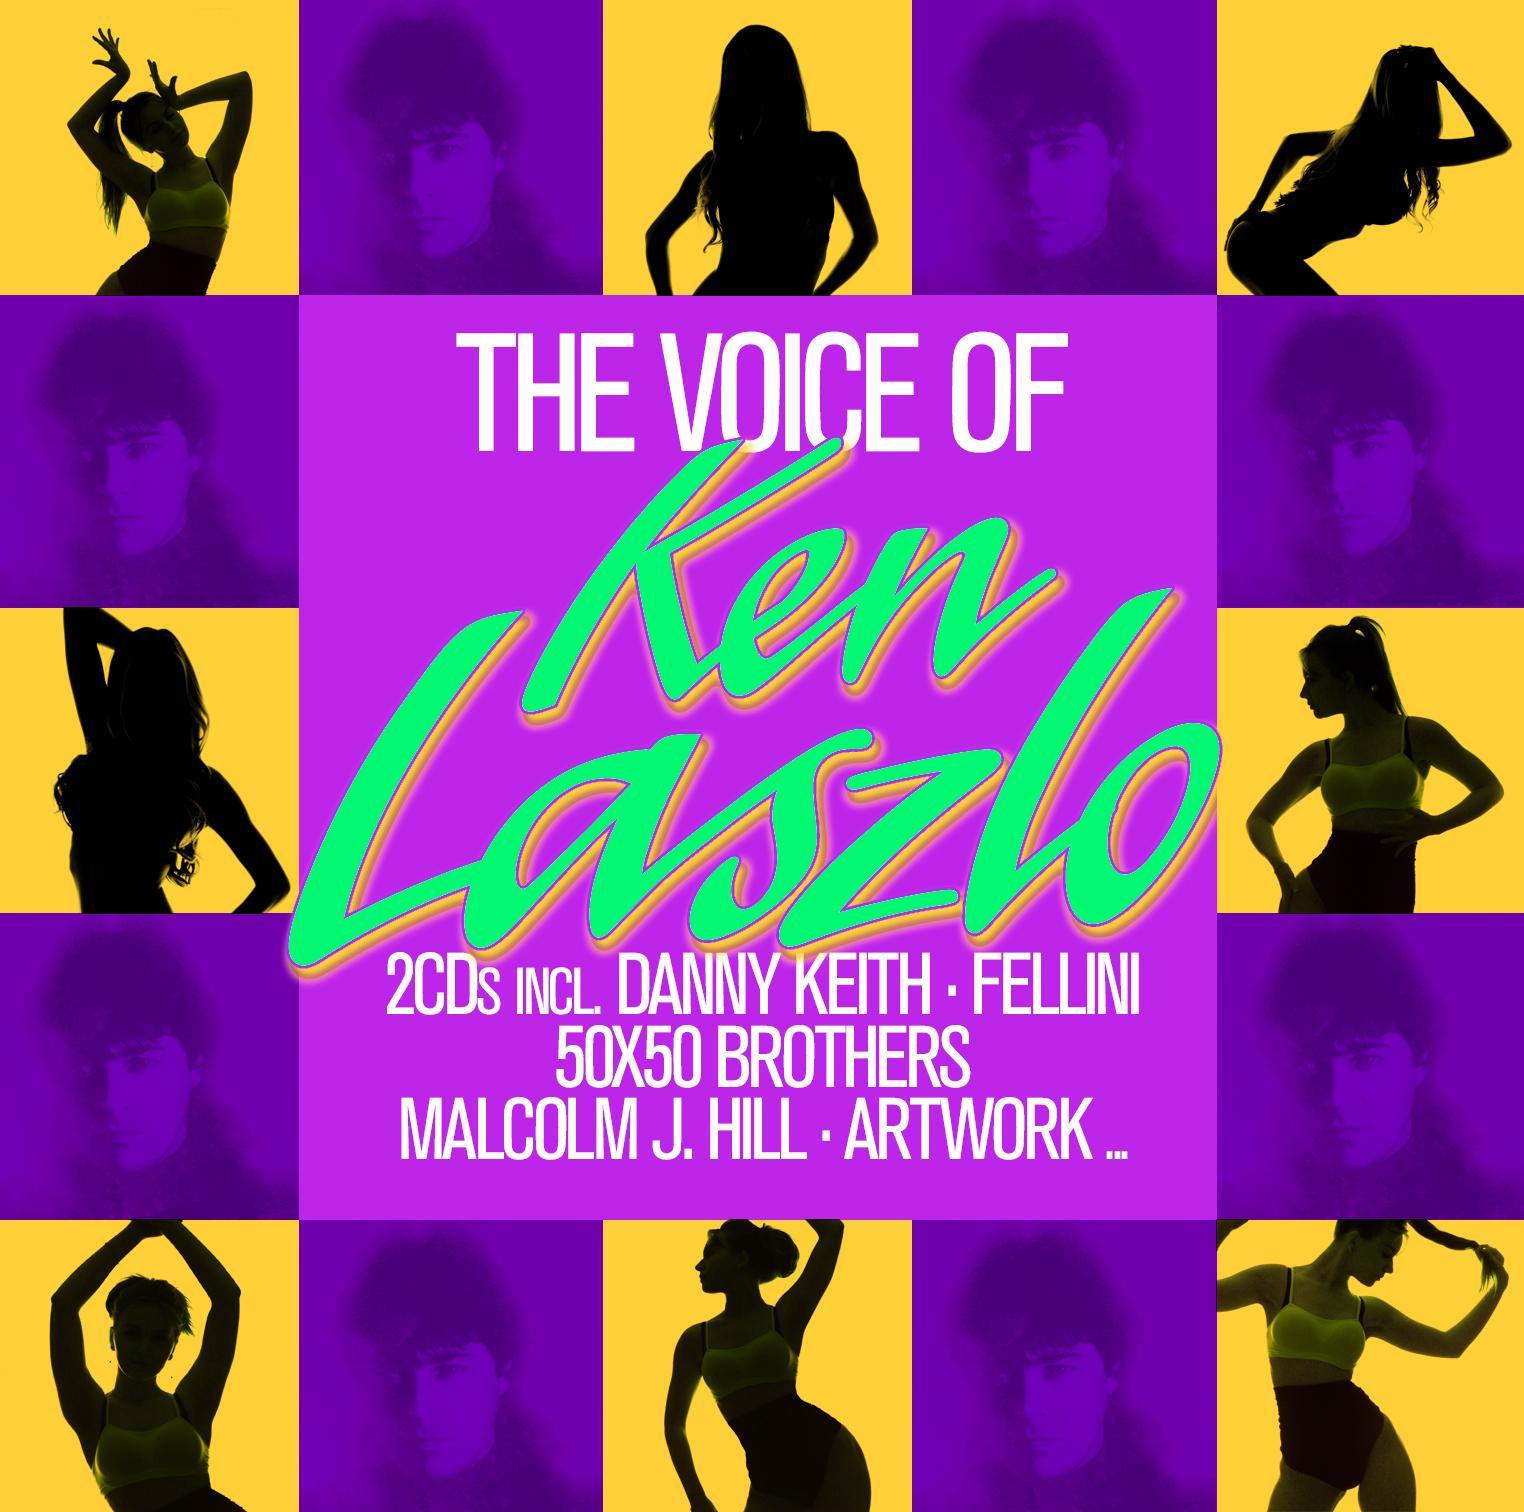 The Voice Of Ken Laszlo (2CD)